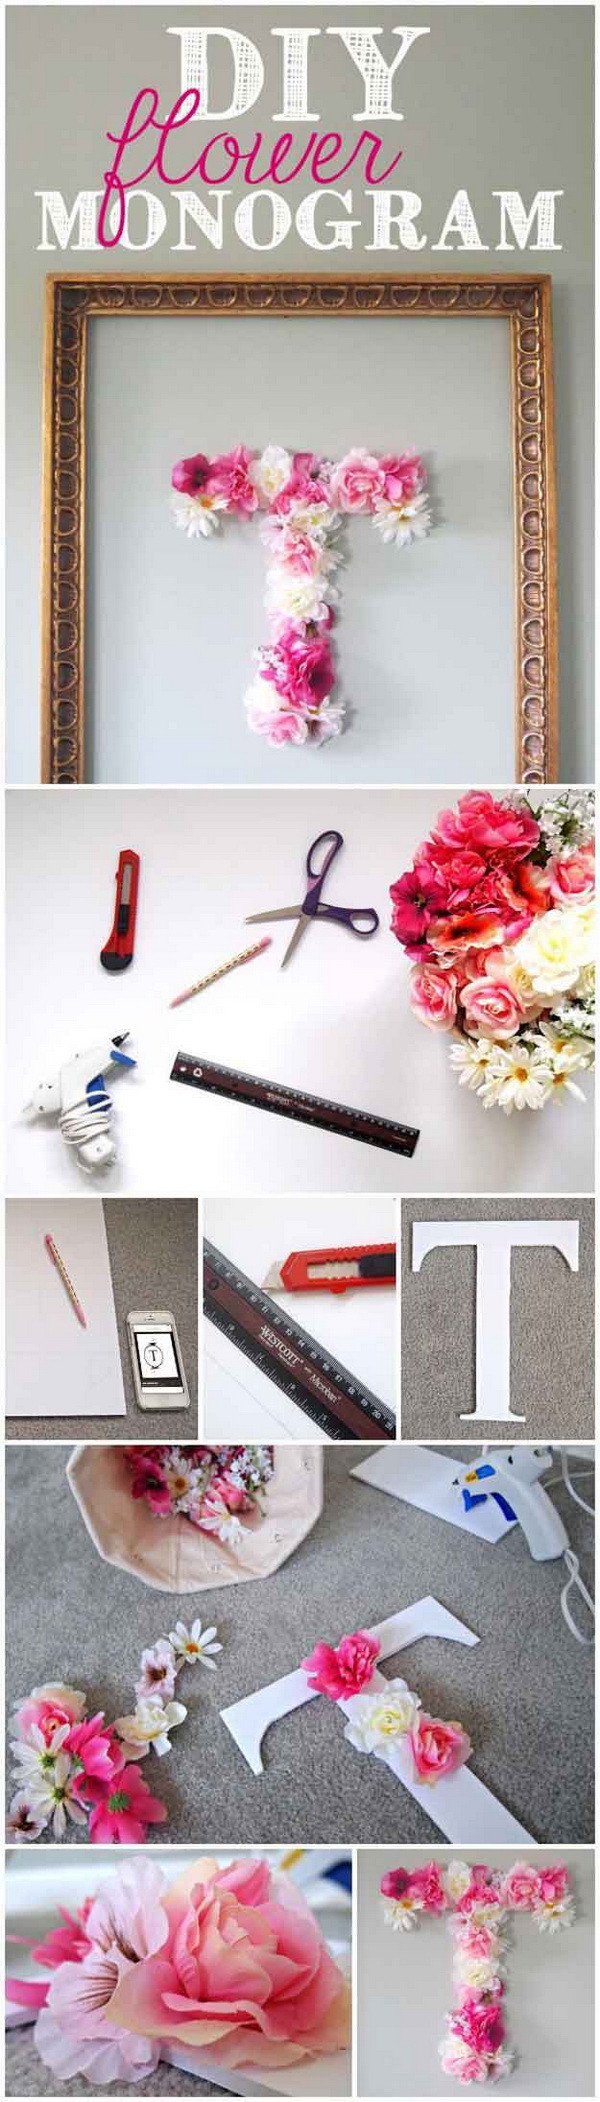 DIY Room Decorations For Girls  Cool DIY Ideas & Tutorials for Teenage Girls Bedroom